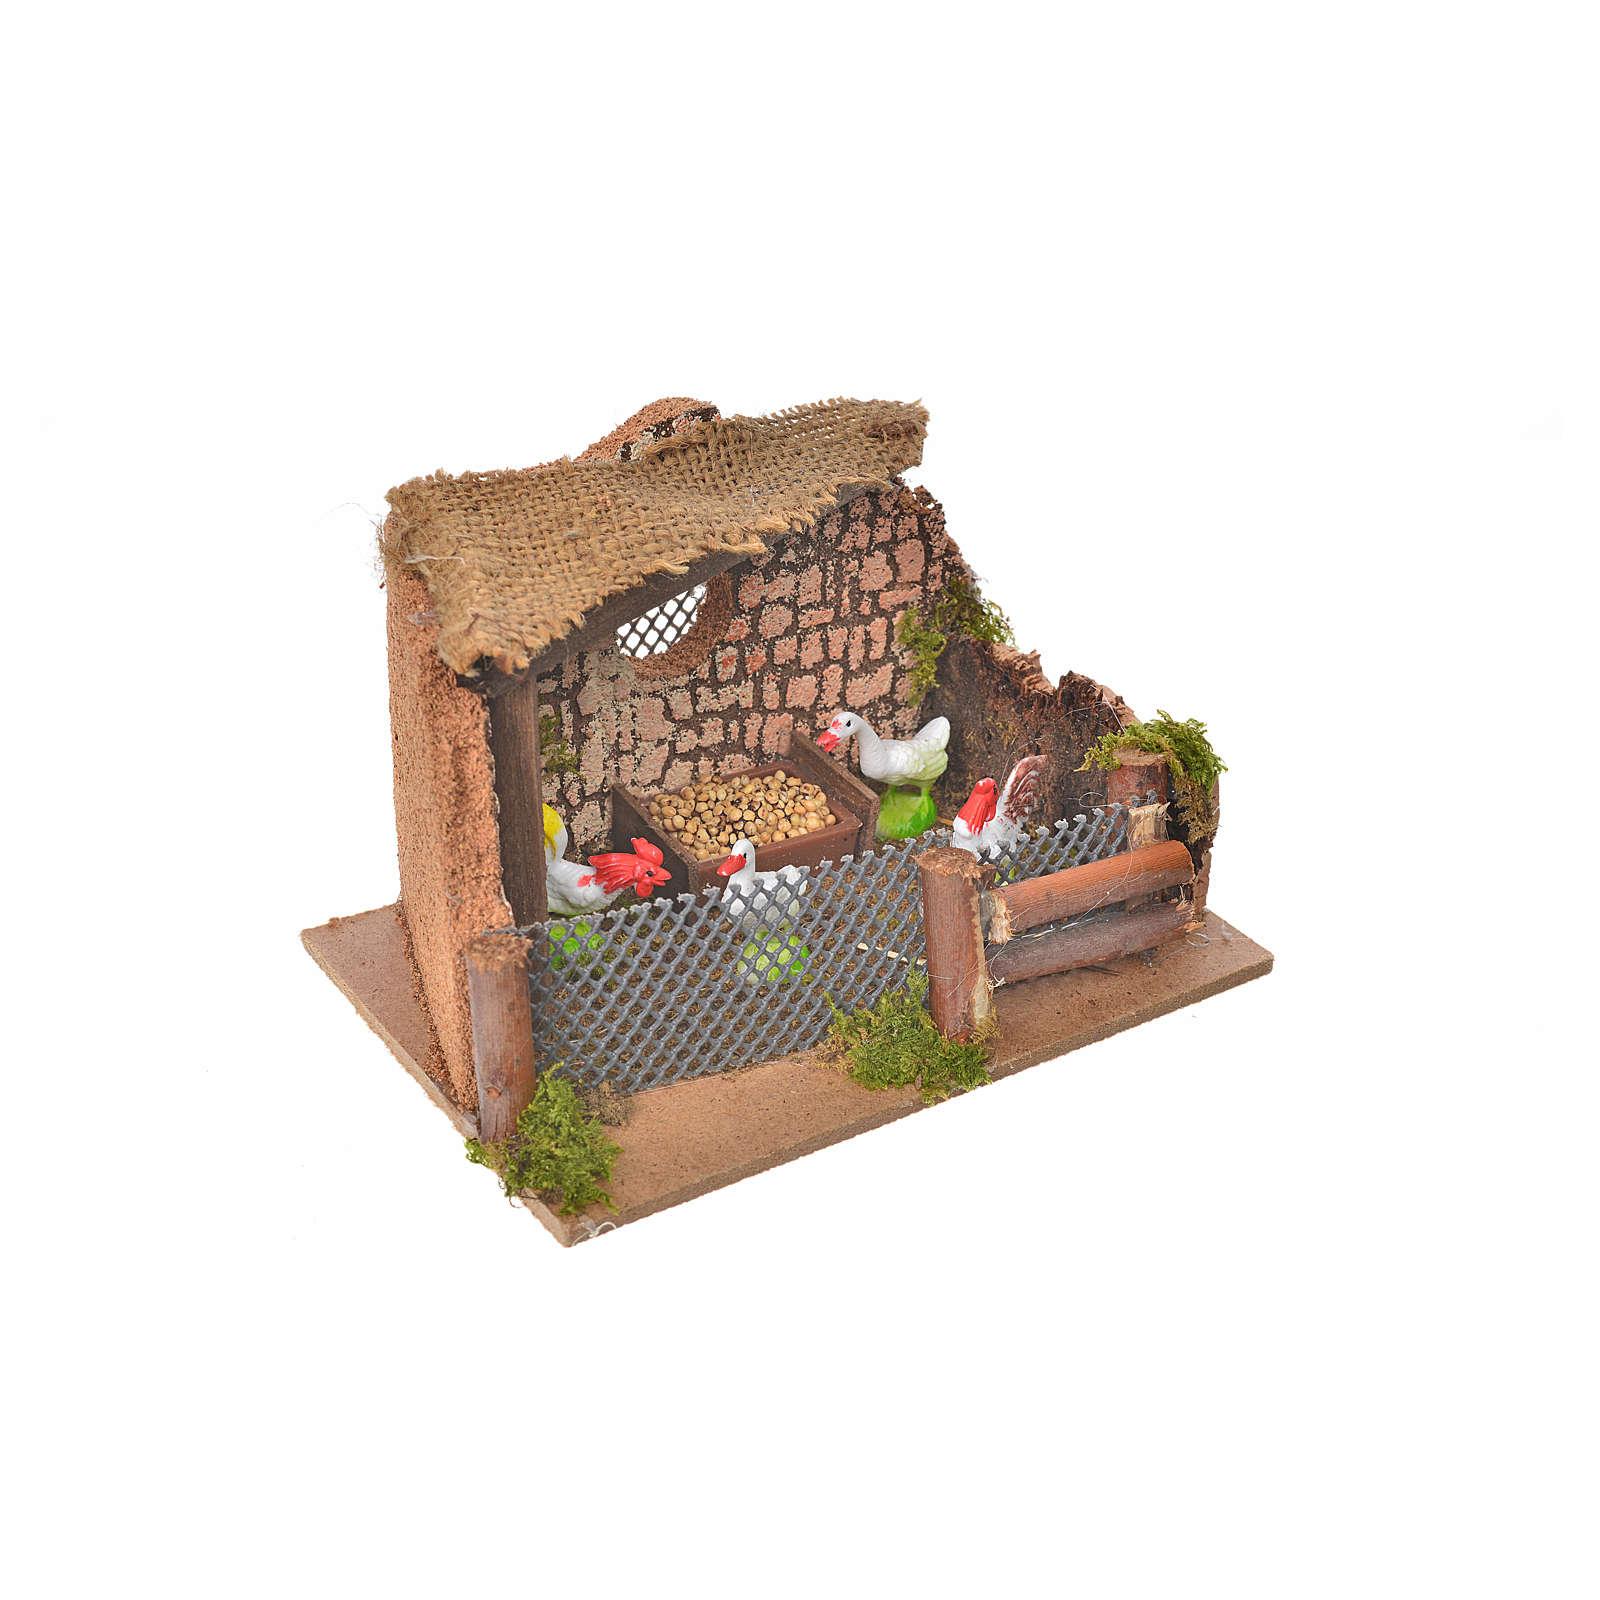 Kogut i kura za ogrodzeniem 11x15x10 cm 4